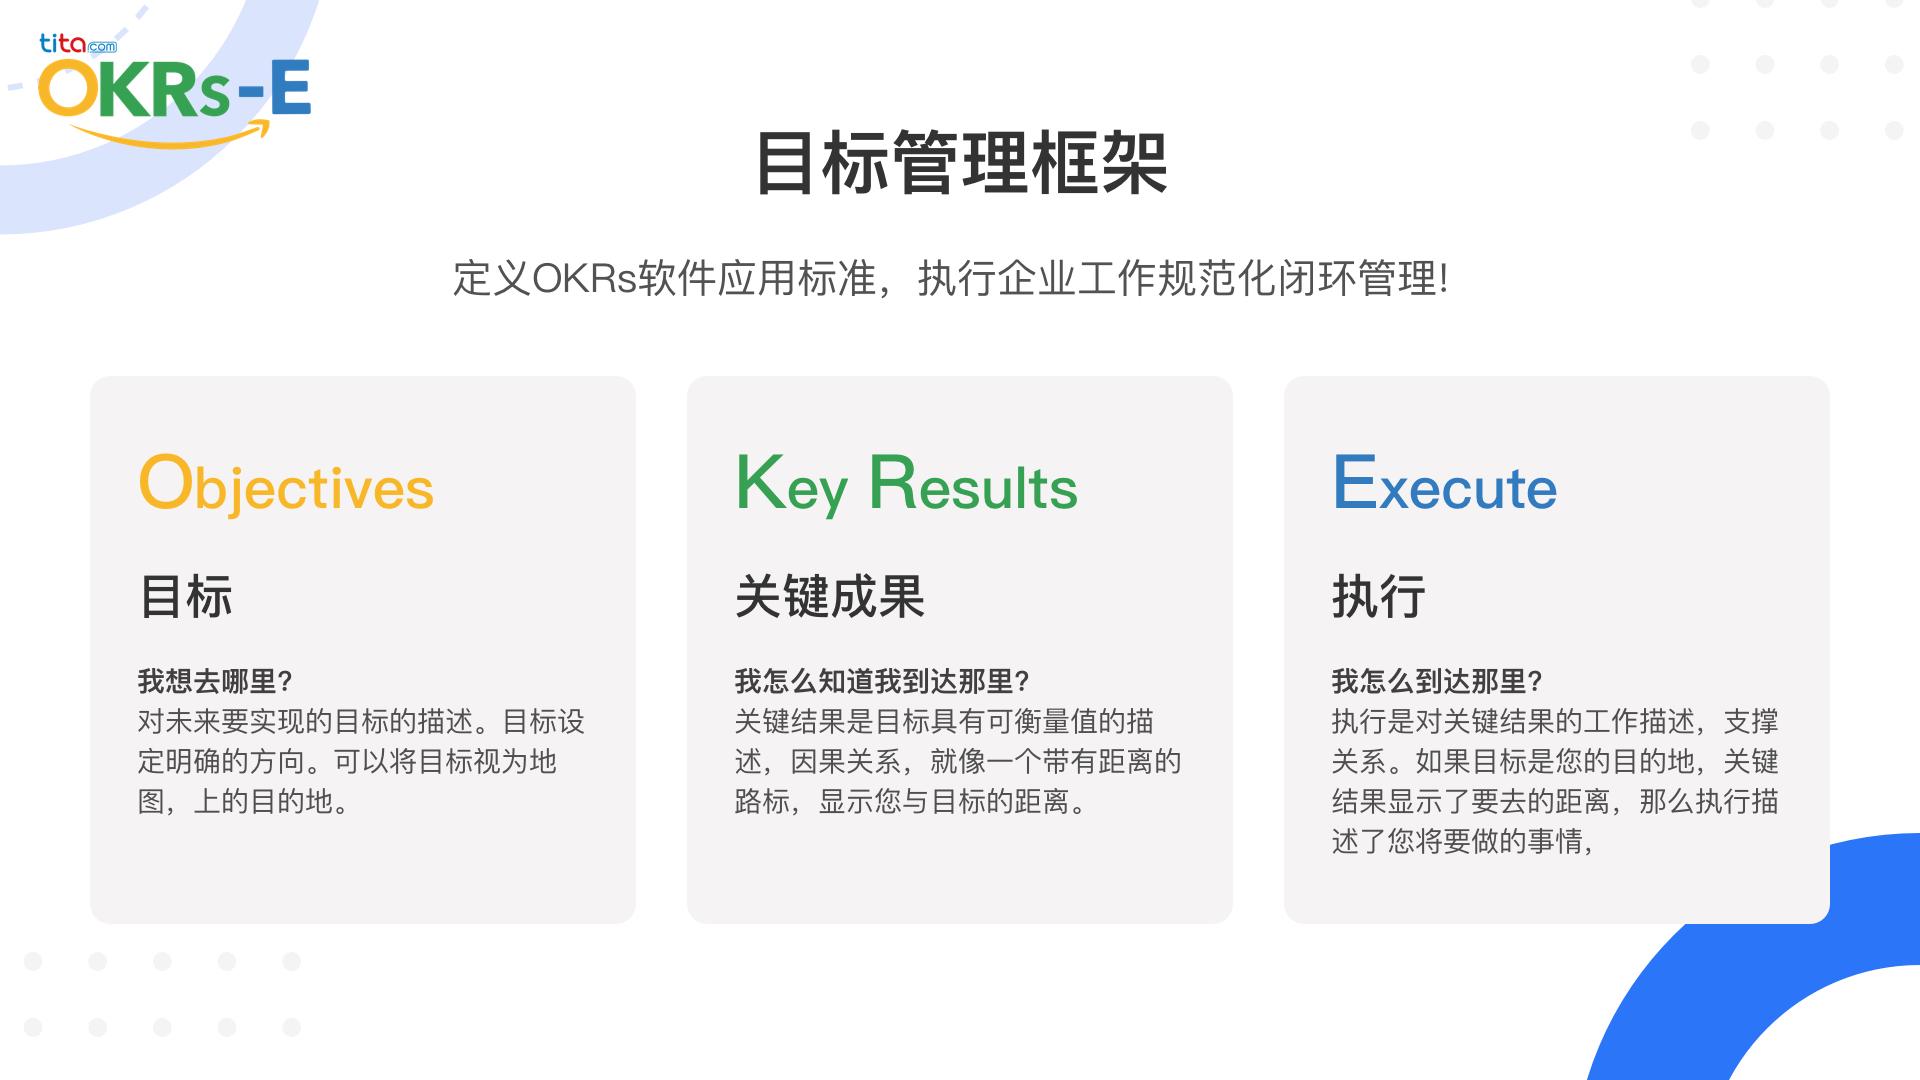 OKRs-E:定义产品团队的目标